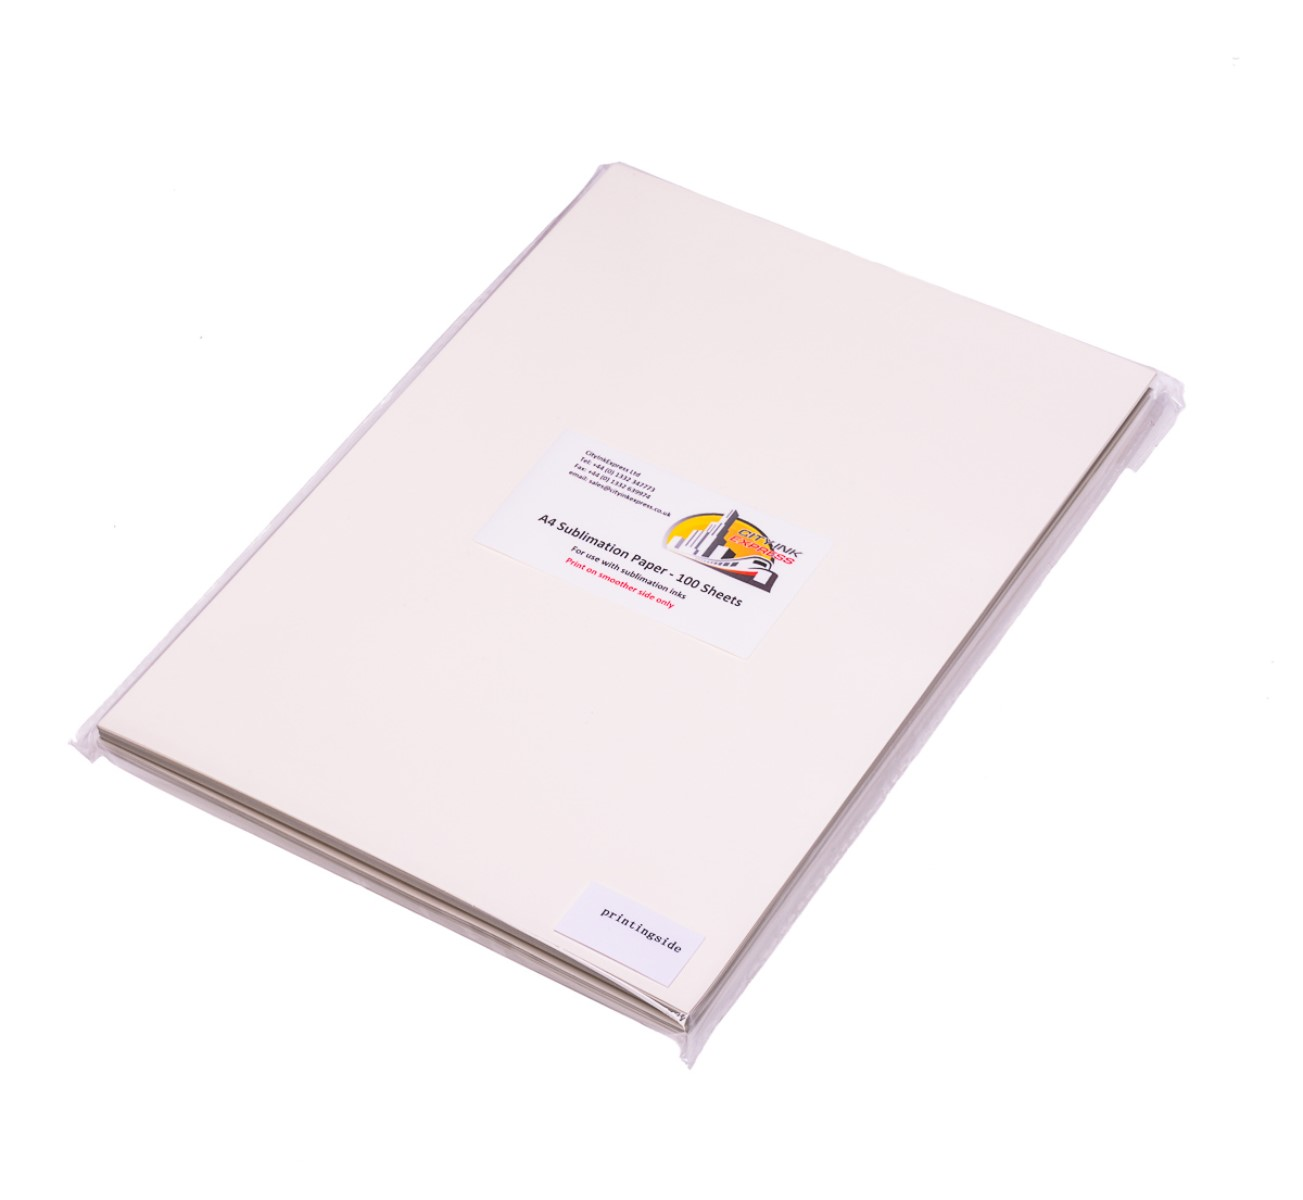 Dye Sublimation Ciss ink system for Epson WF-2830DWF printer #3